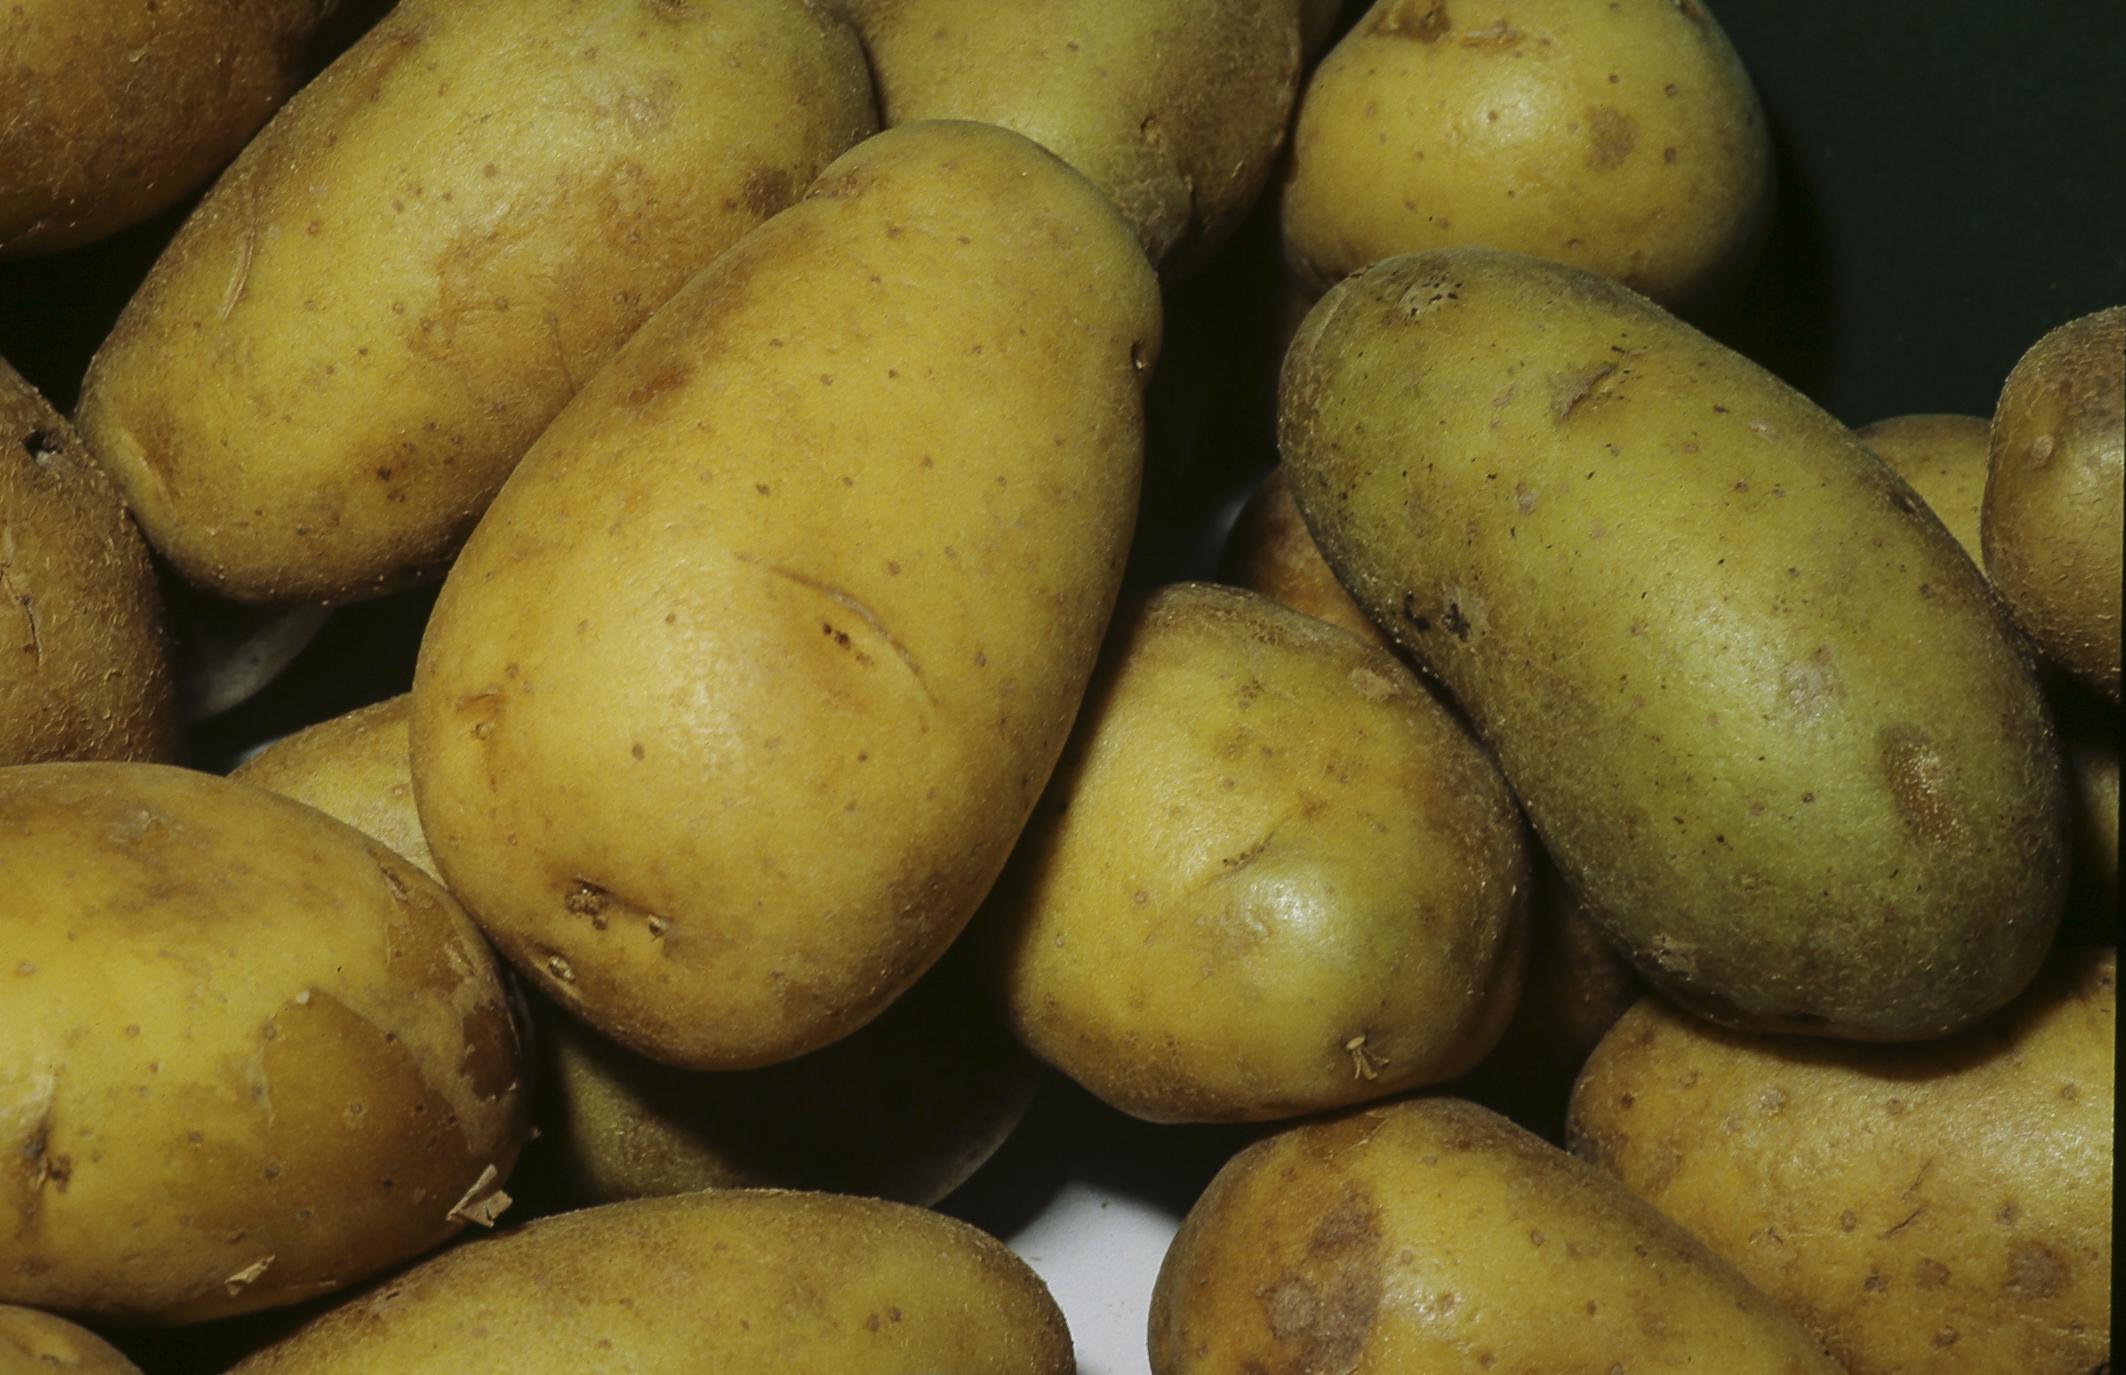 سیب زمینی اسپریت همدان